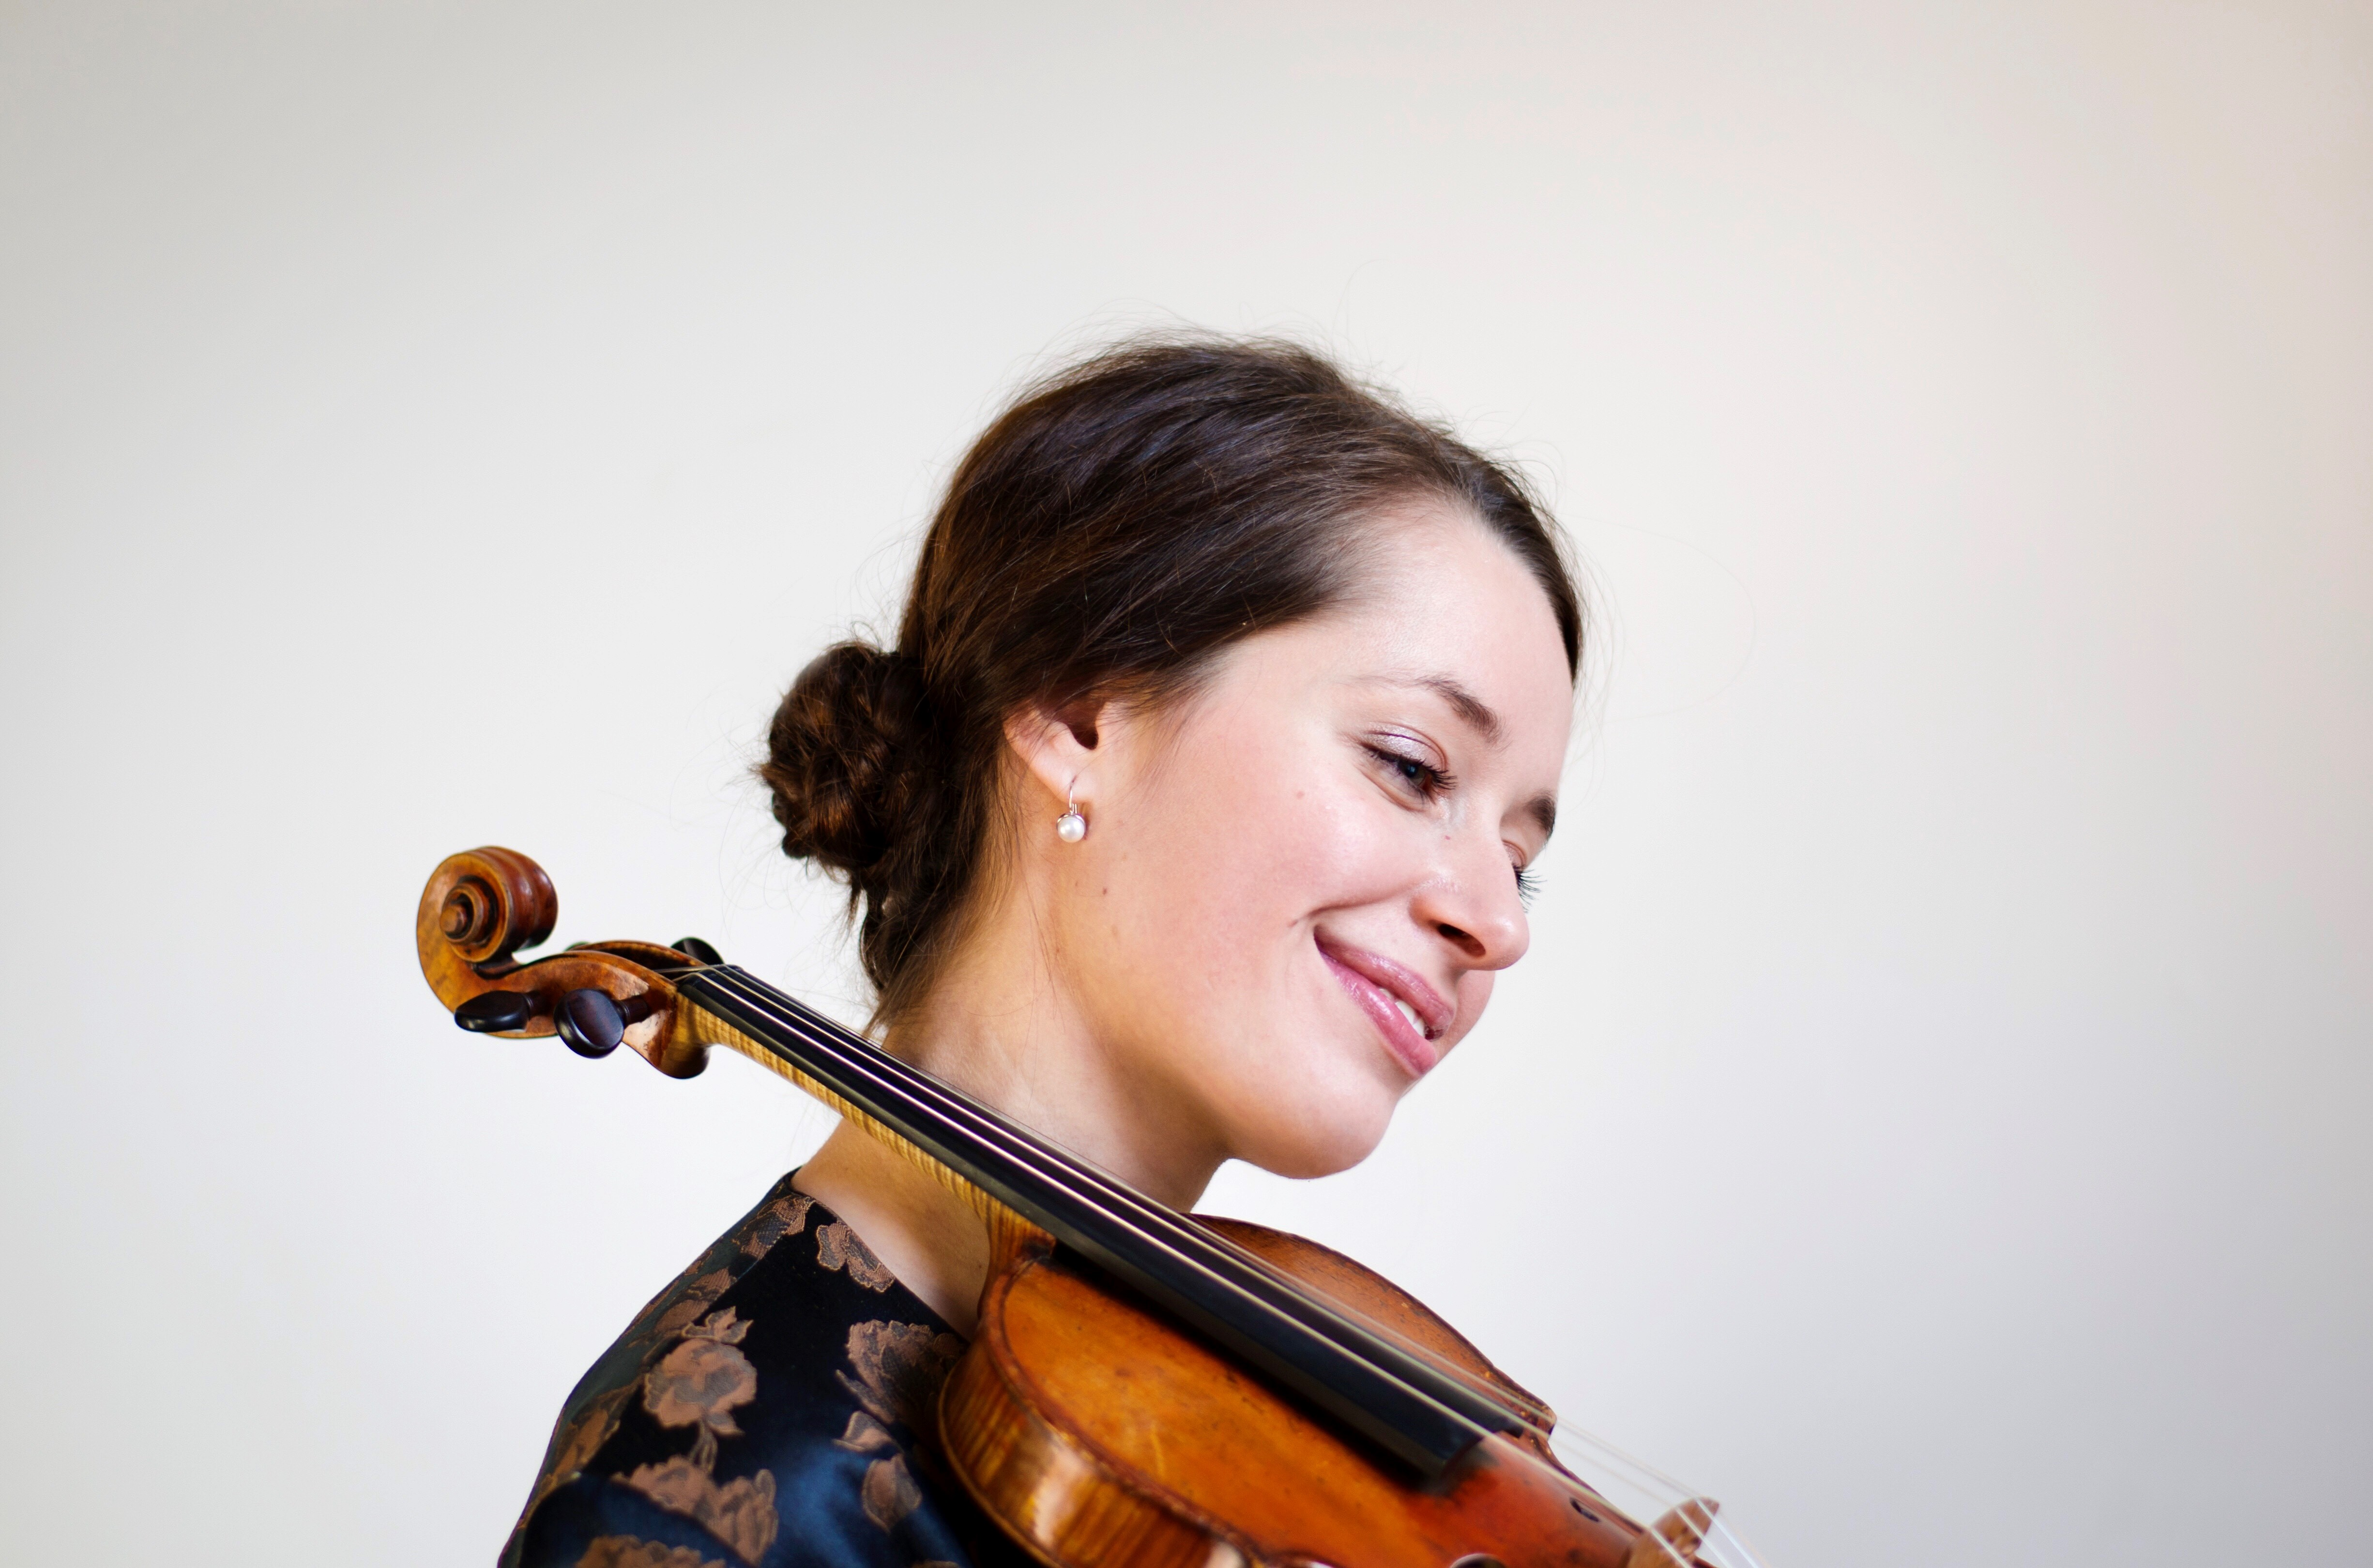 Strains of a Violin